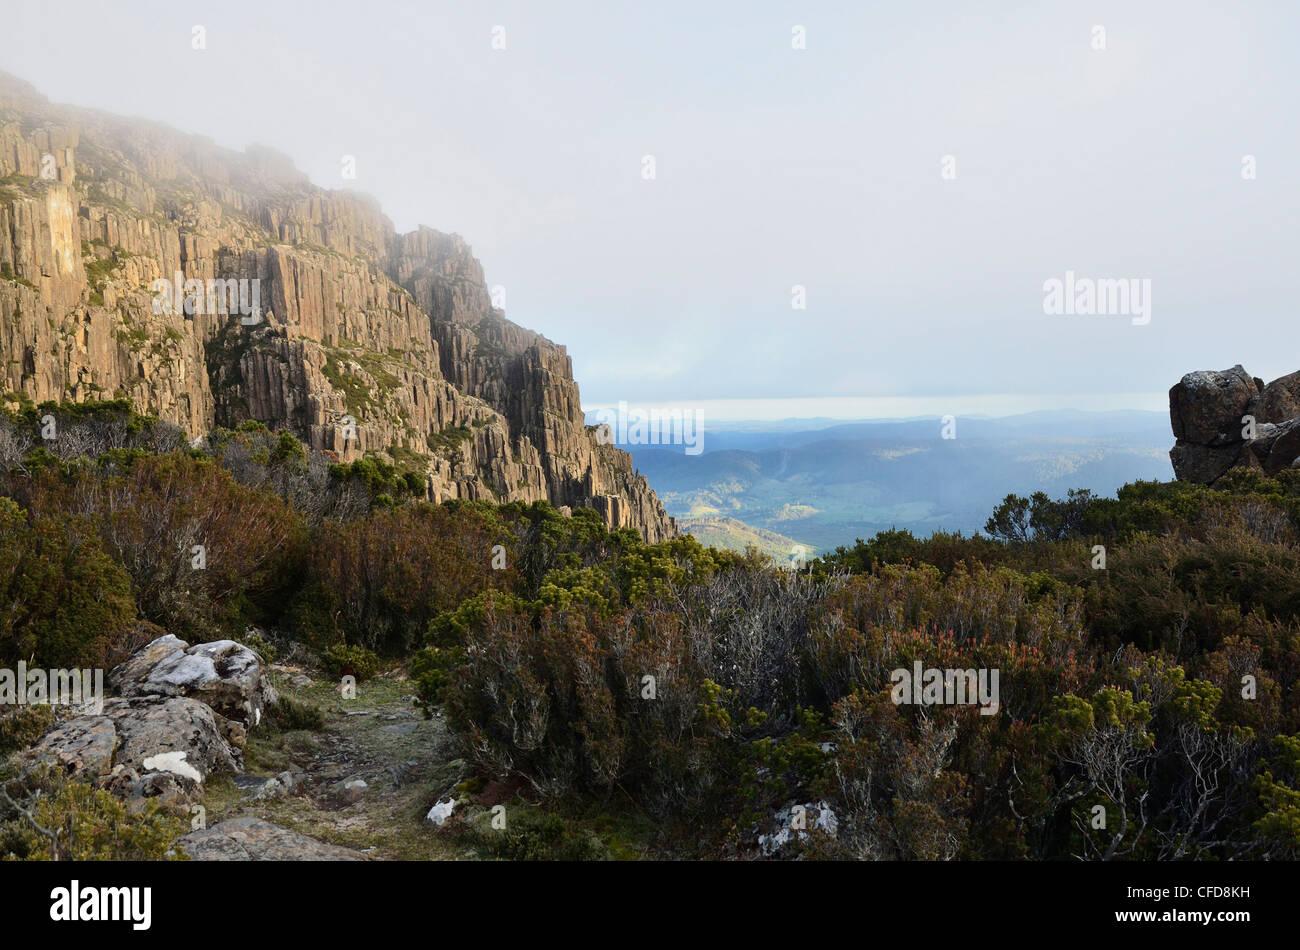 Ben Lomond, Ben Lomond National Park, Tasmania, Australia, Pacific - Stock Image